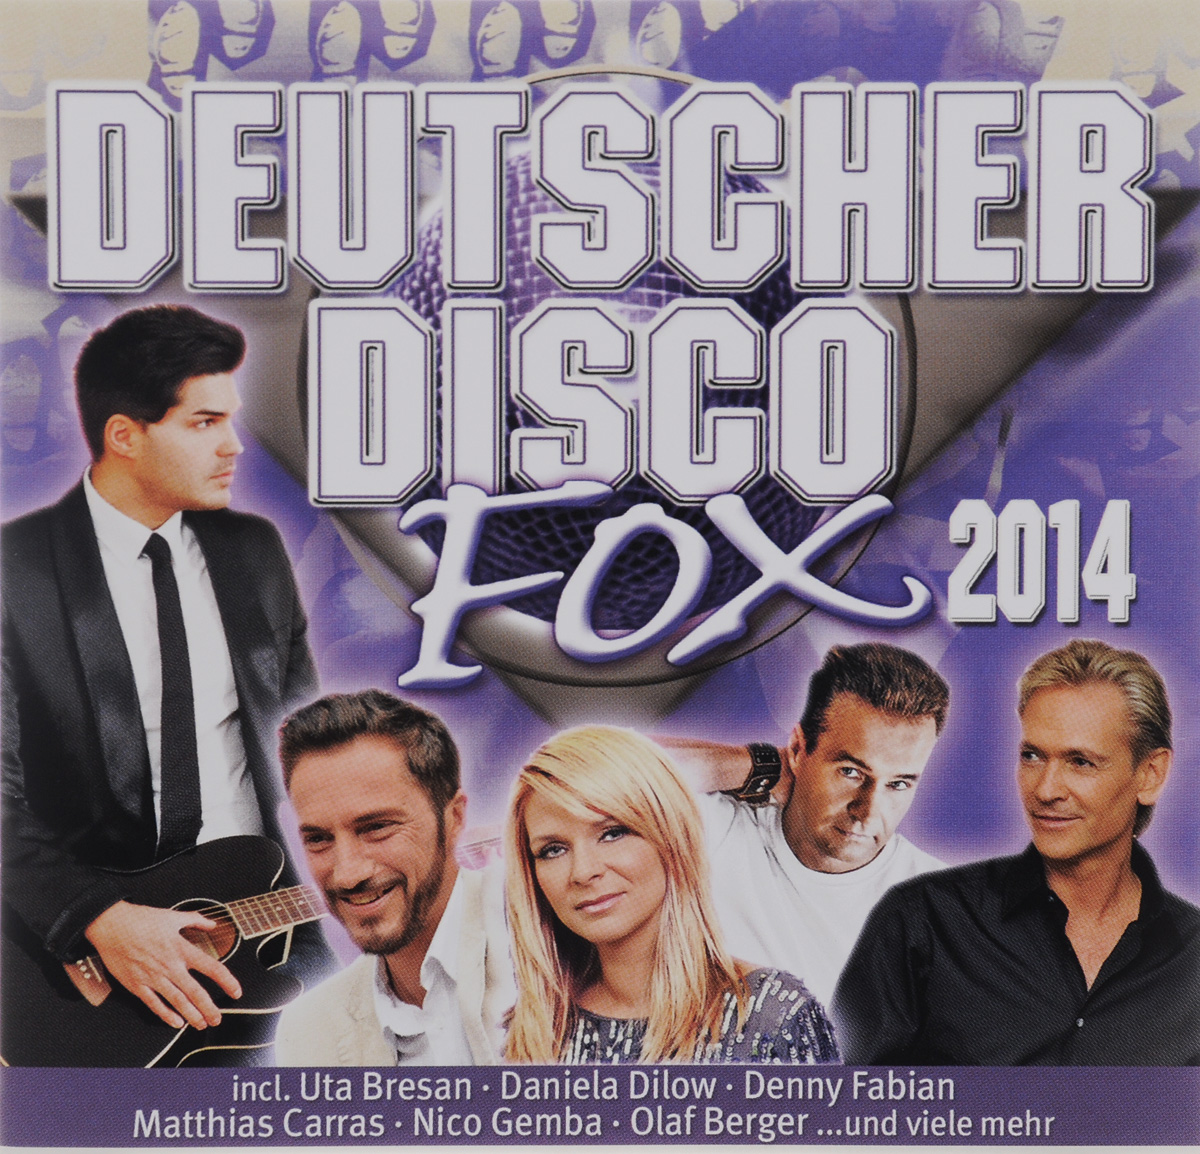 Deutscher Disco Fox 2014 (2 CD)